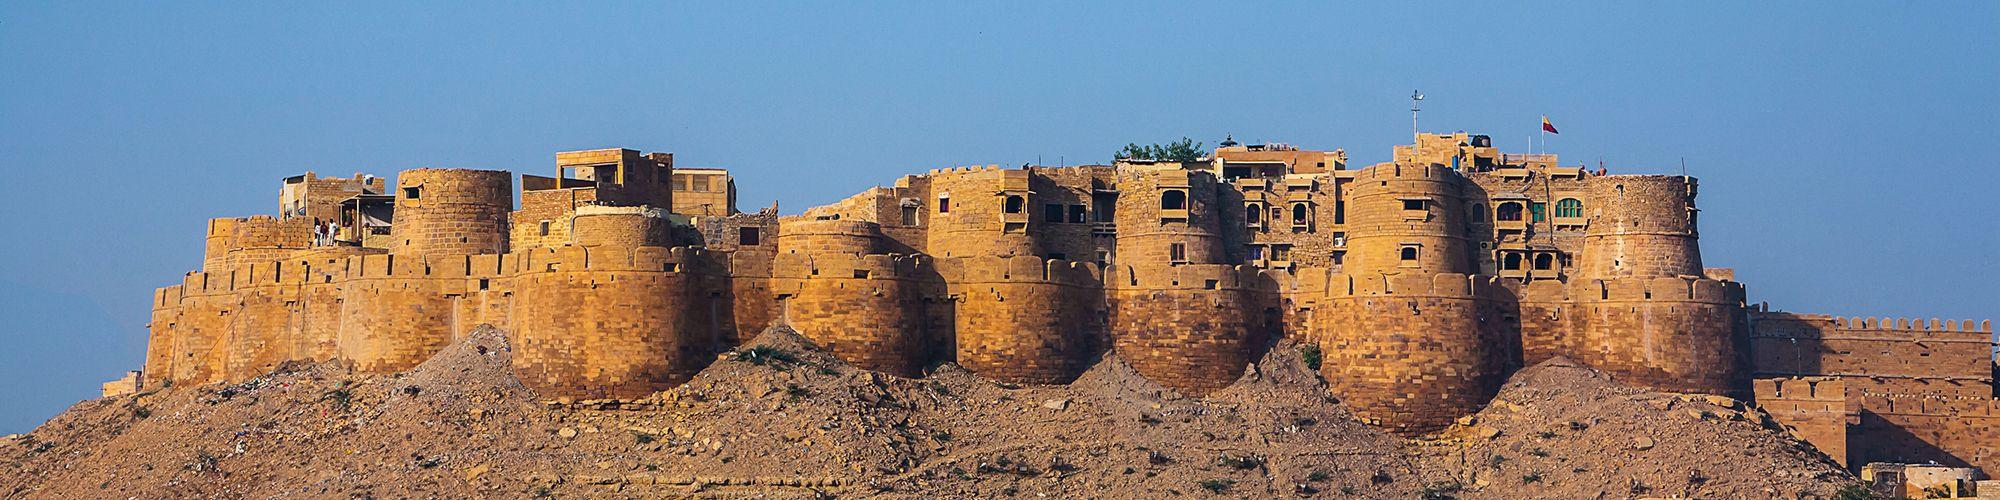 Fort, Jaisalmer, Rajasthan